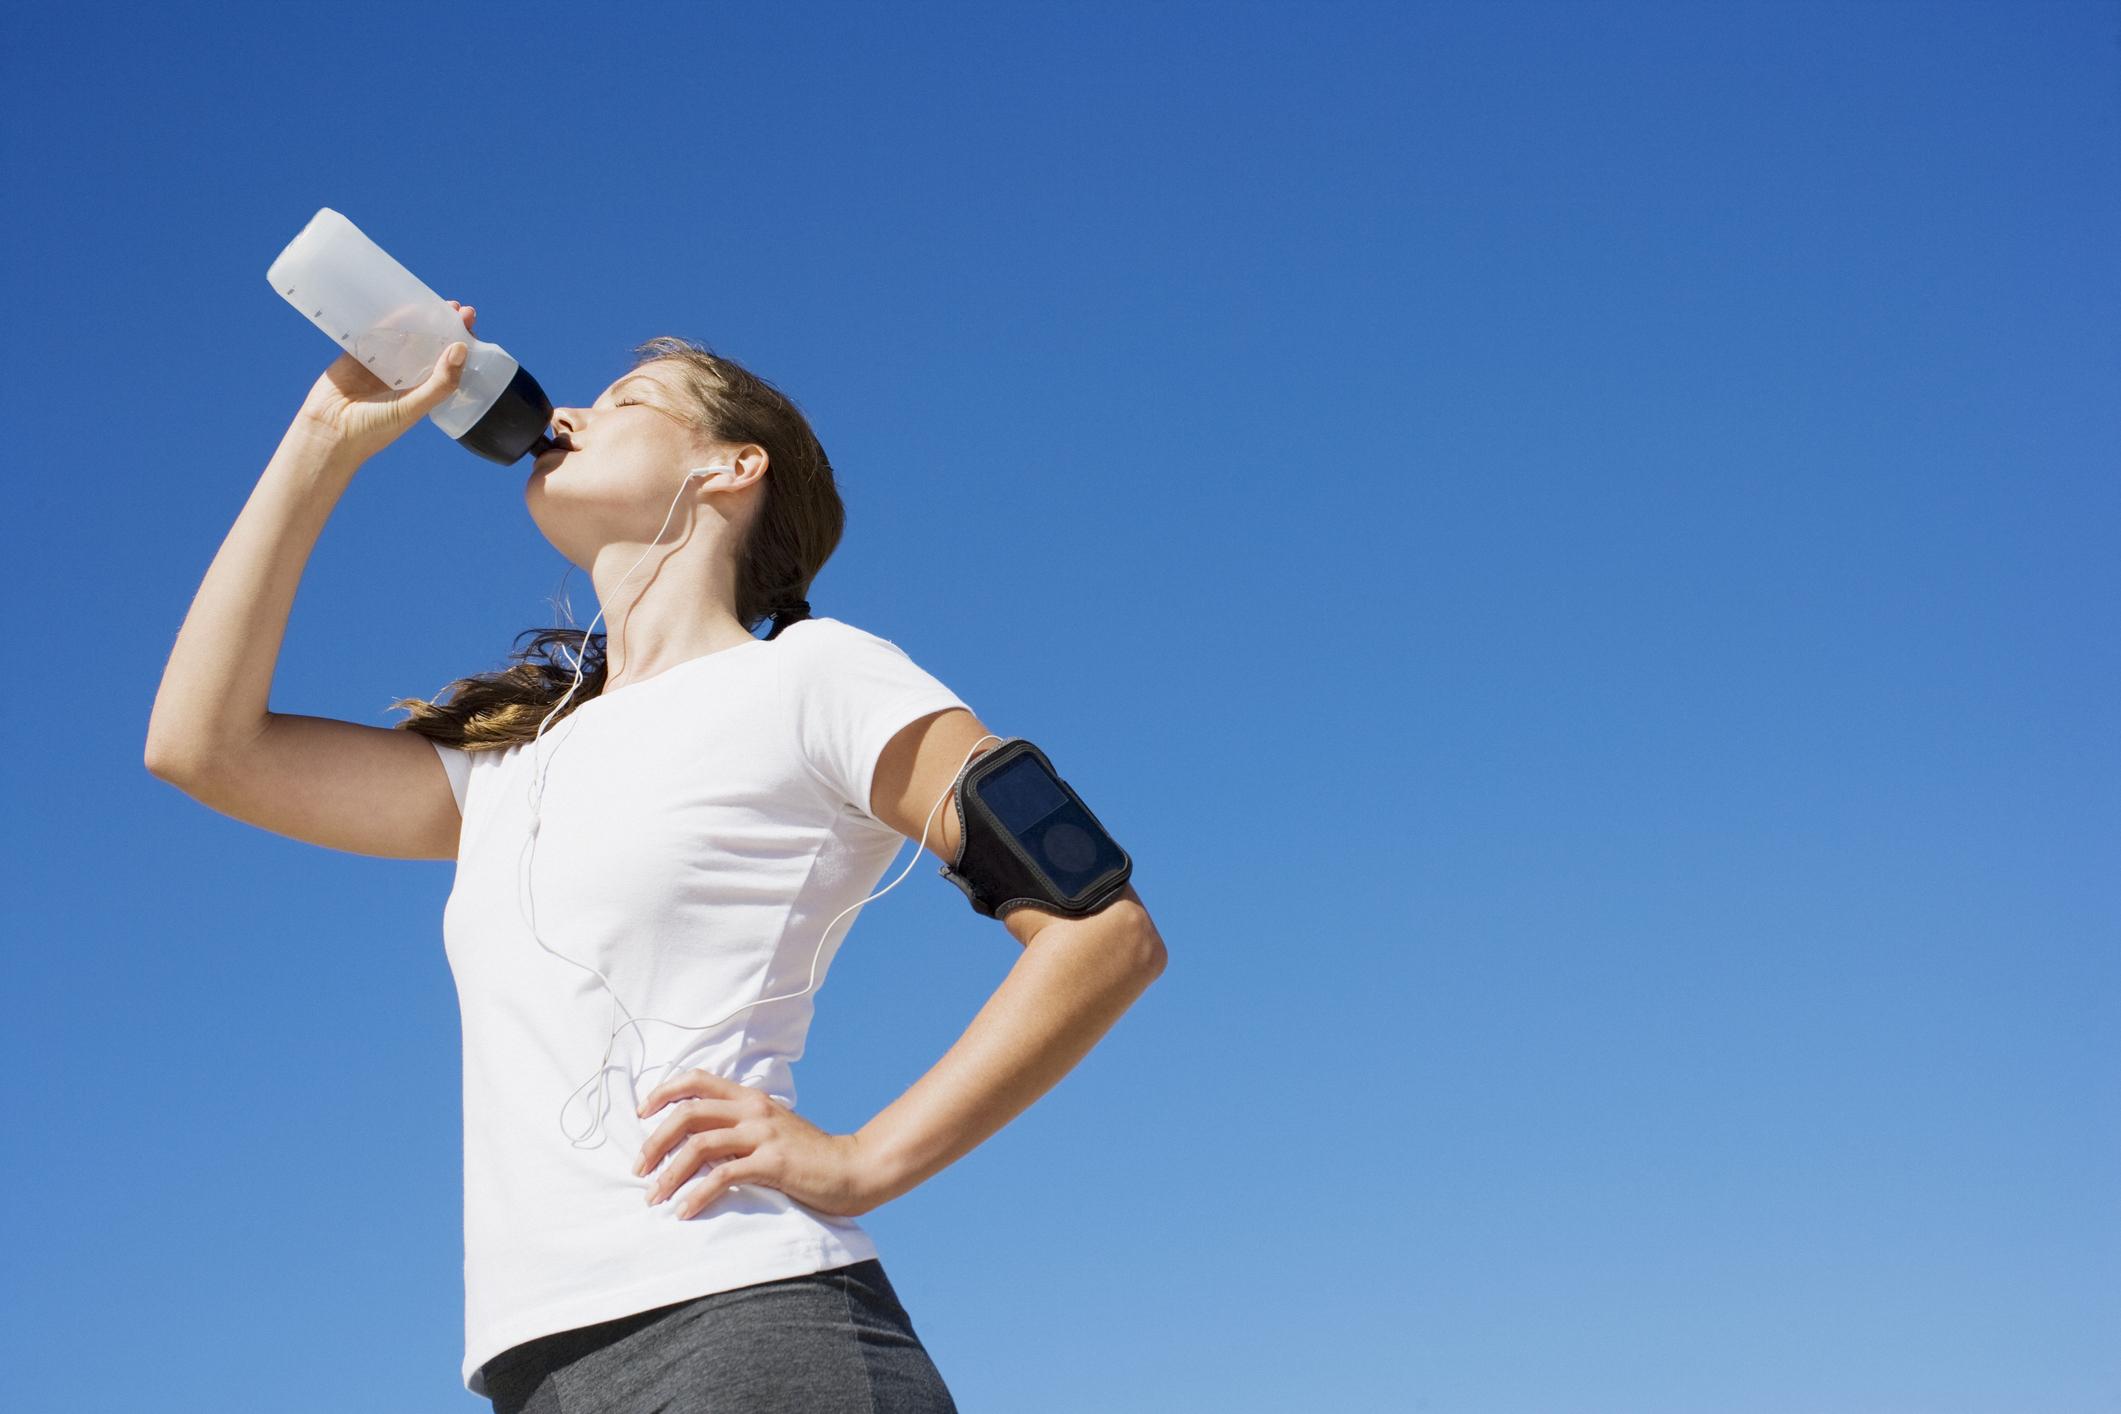 Woman in athletic wear drinking from a water bottle.